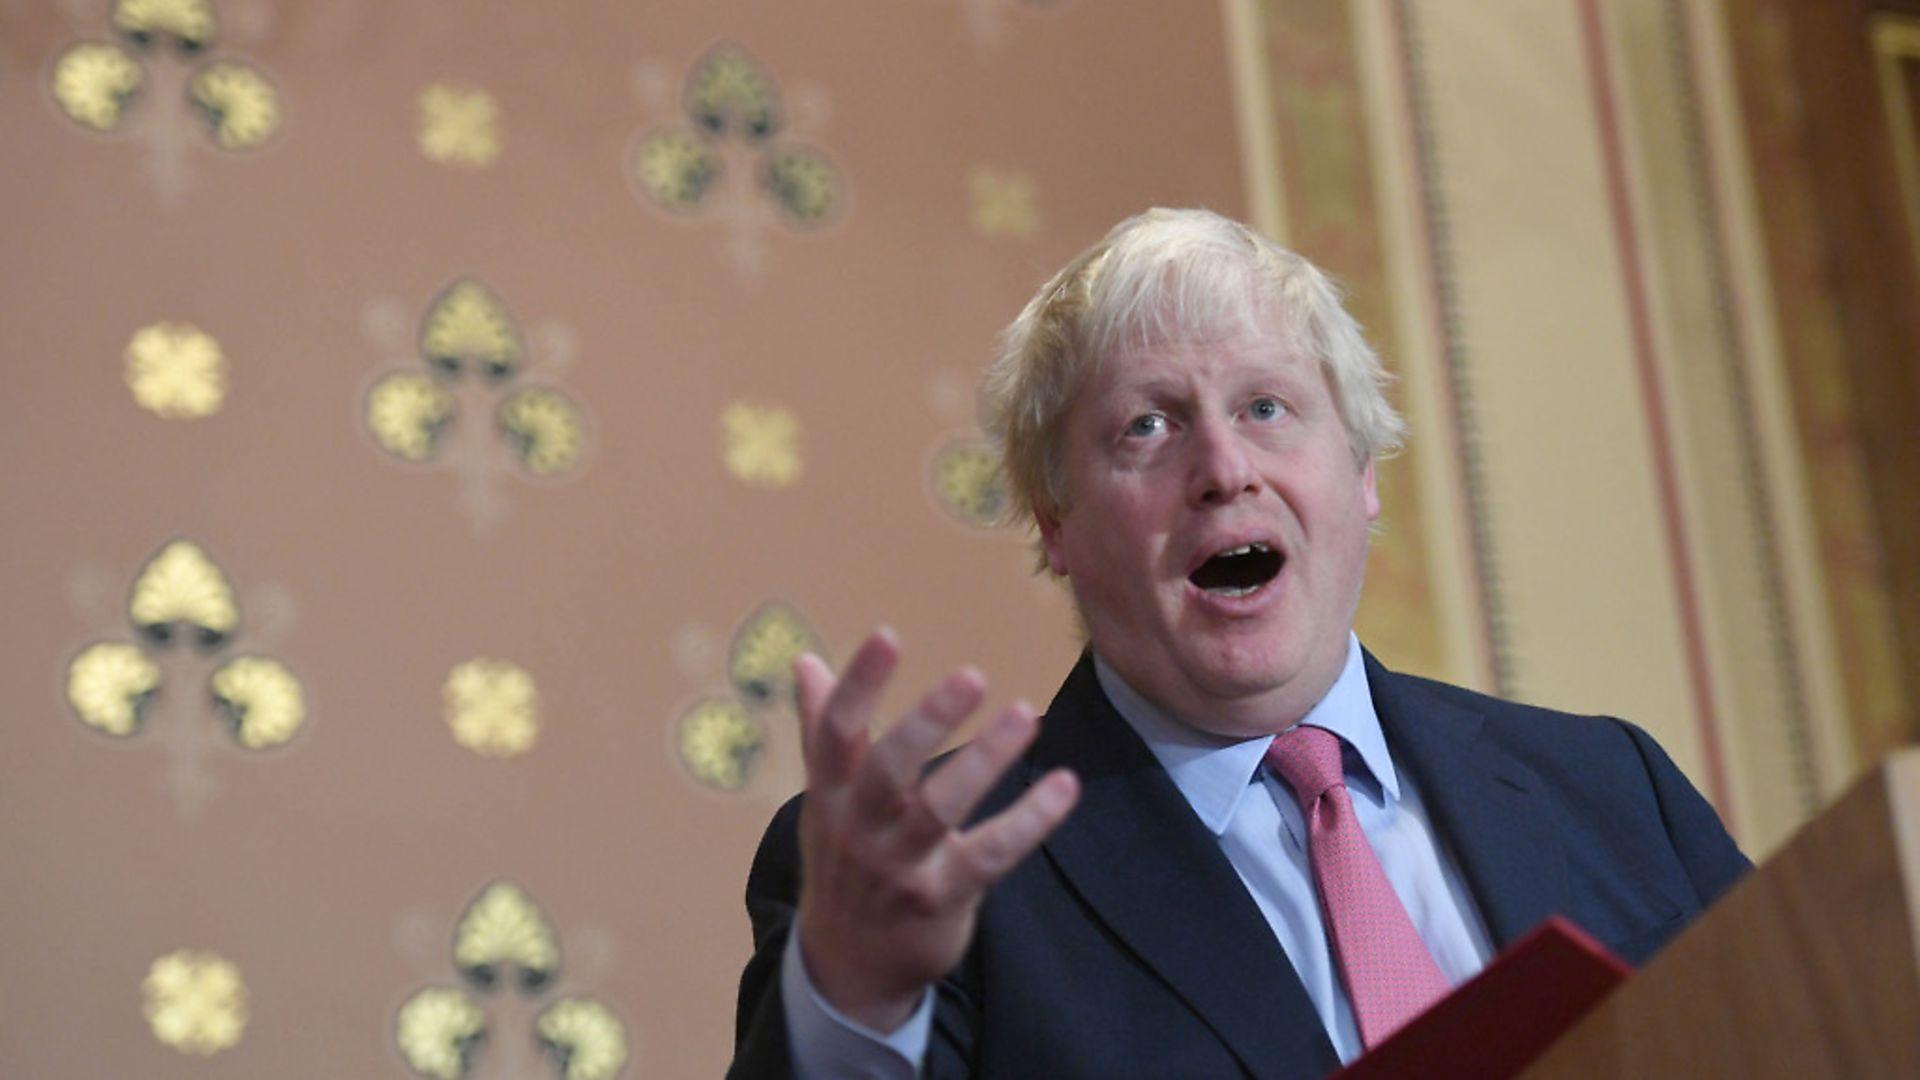 Bungling Brexit bombshell Boris Johnson - Credit: PA Wire/PA Images